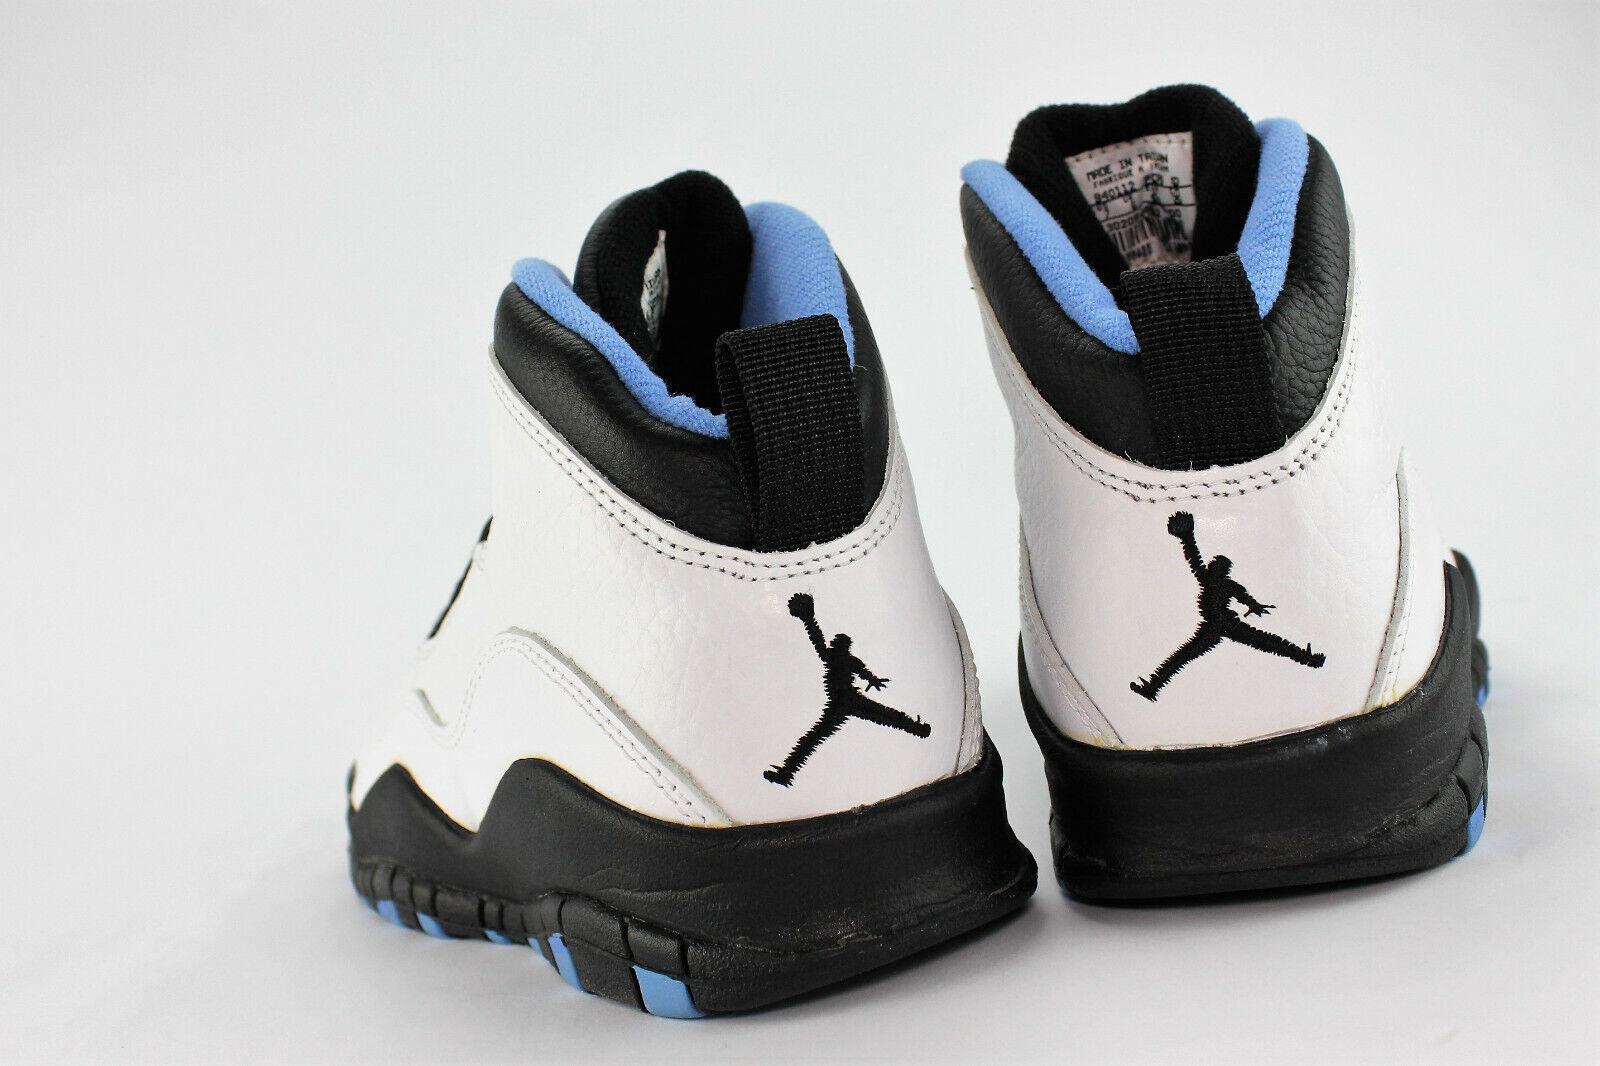 Nike Air Jordan 10 10 10 Puderblau X Größe 7 608m 130209 102 a3594f